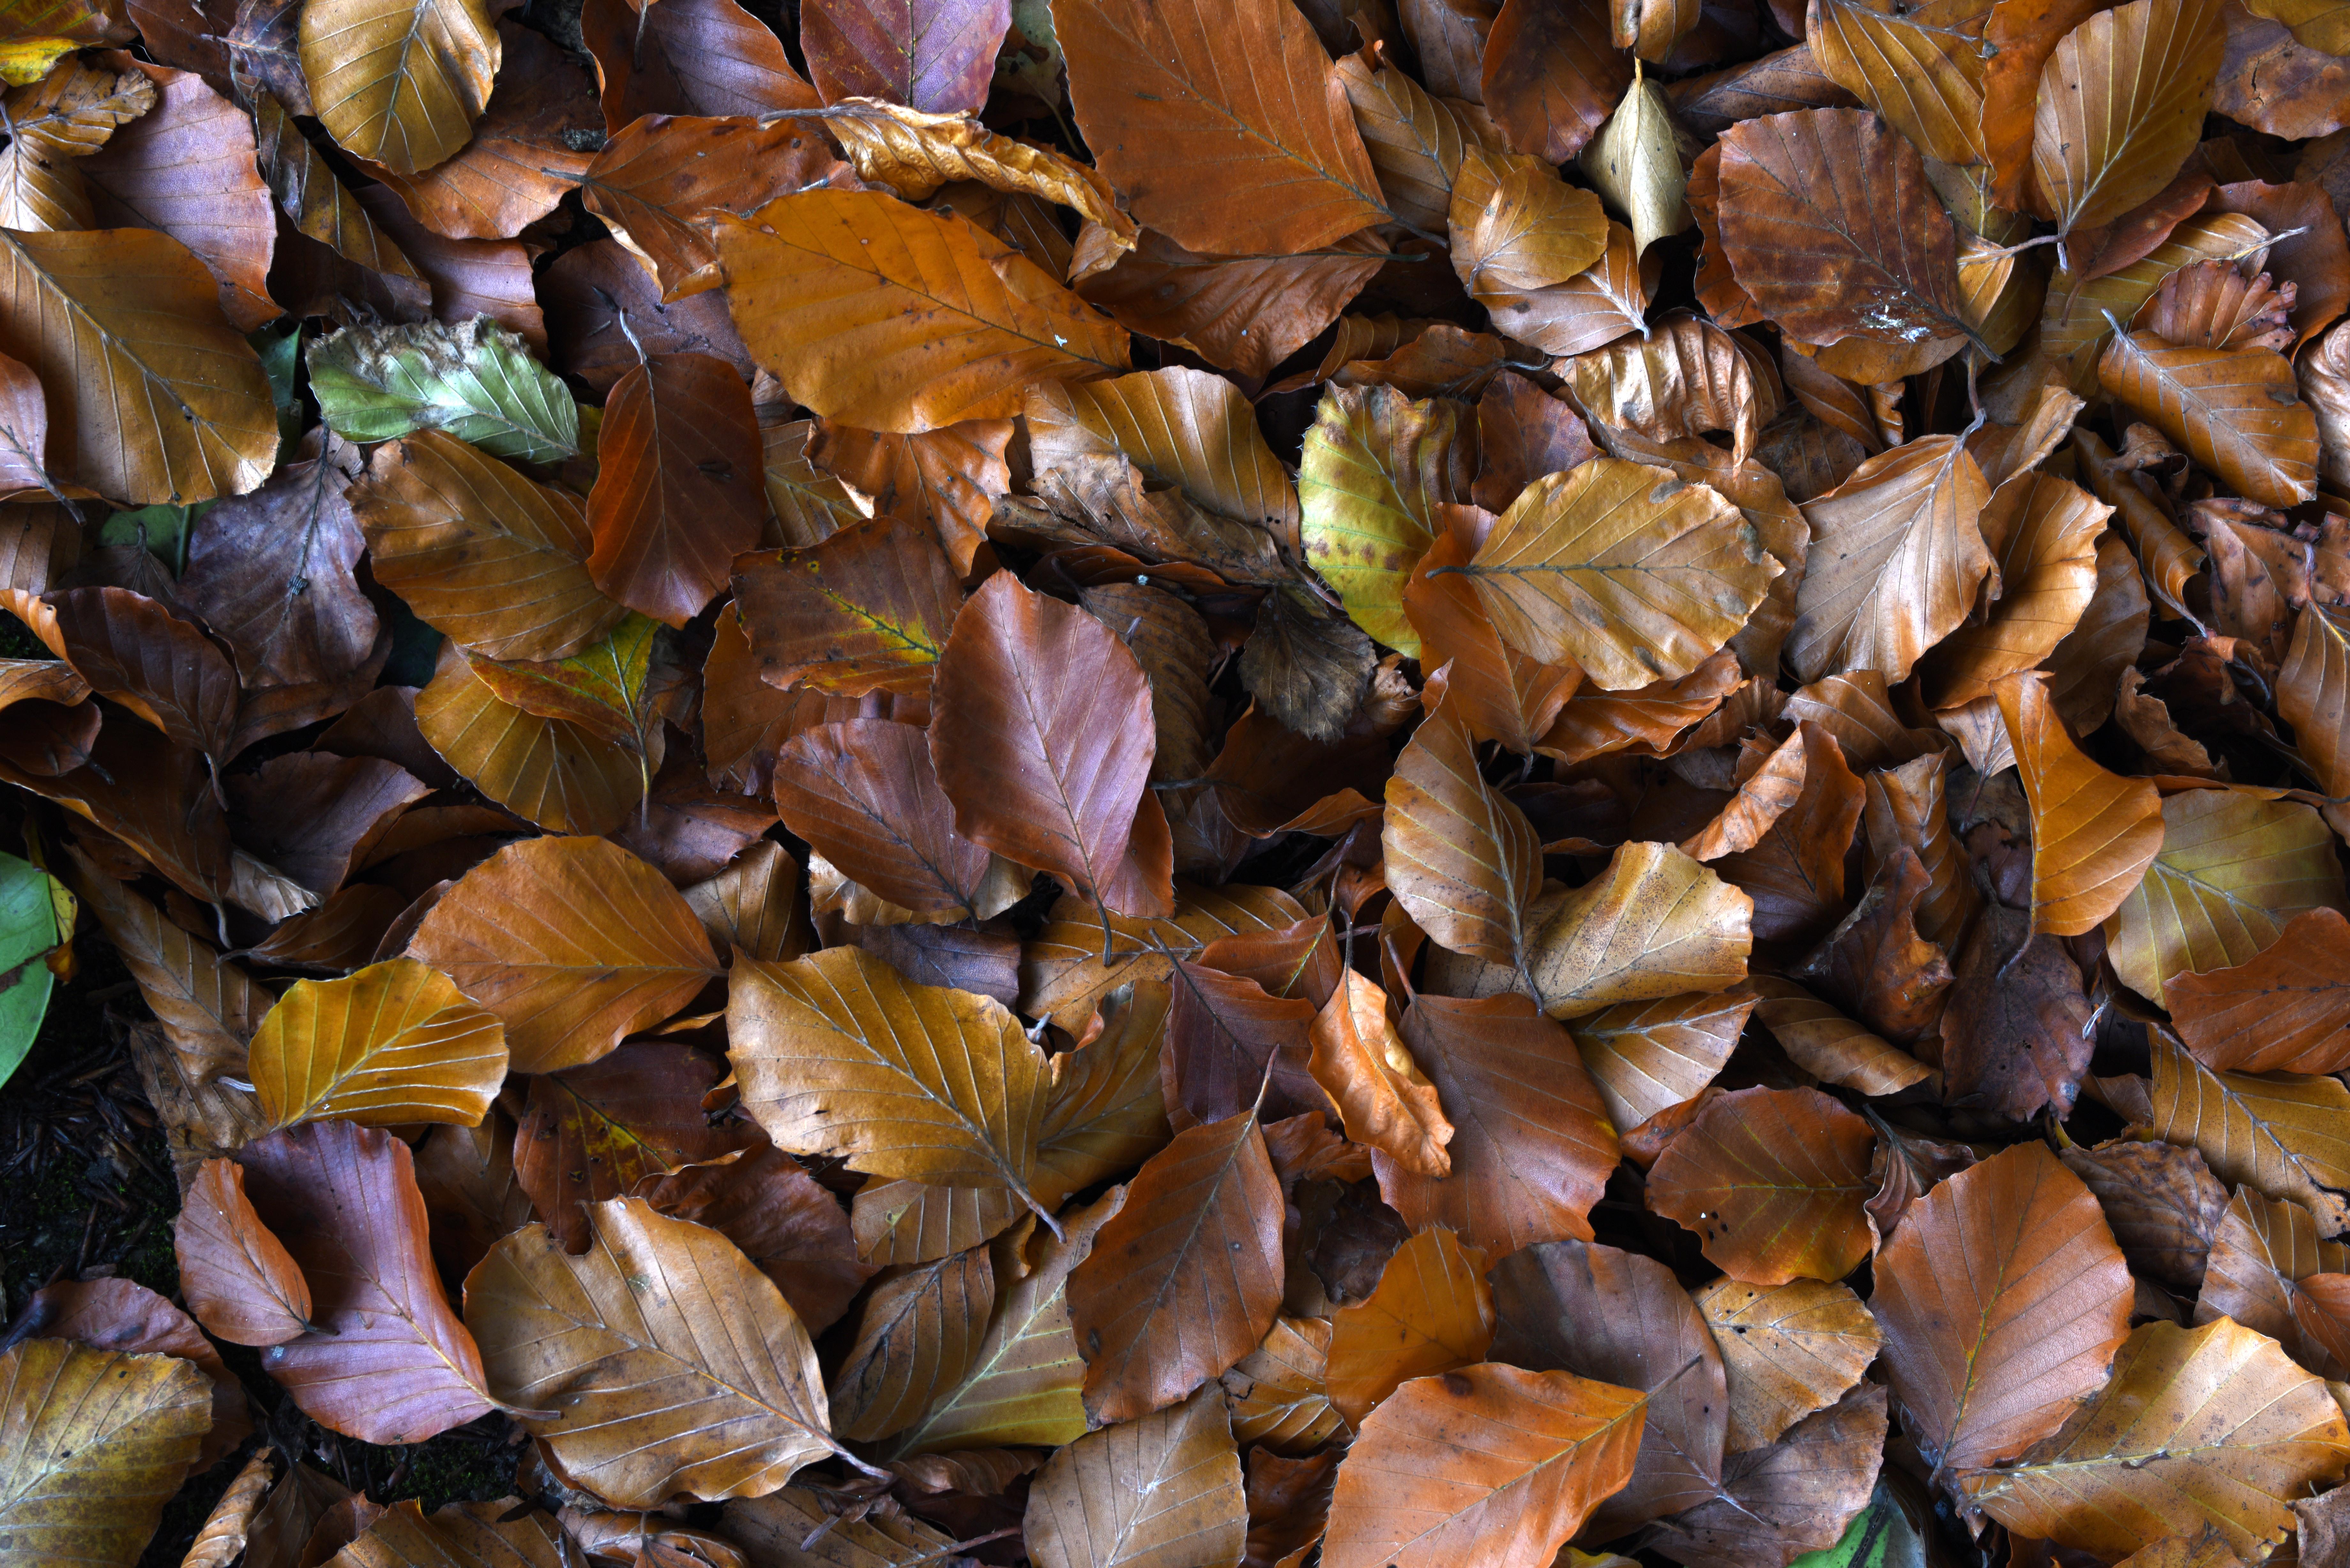 Meike 85mm F 28 Macro Review F28 Lens For Nikon Dslr Autumn Leaves At F8 1 13 Sec 20 1050 Mm Iso 100